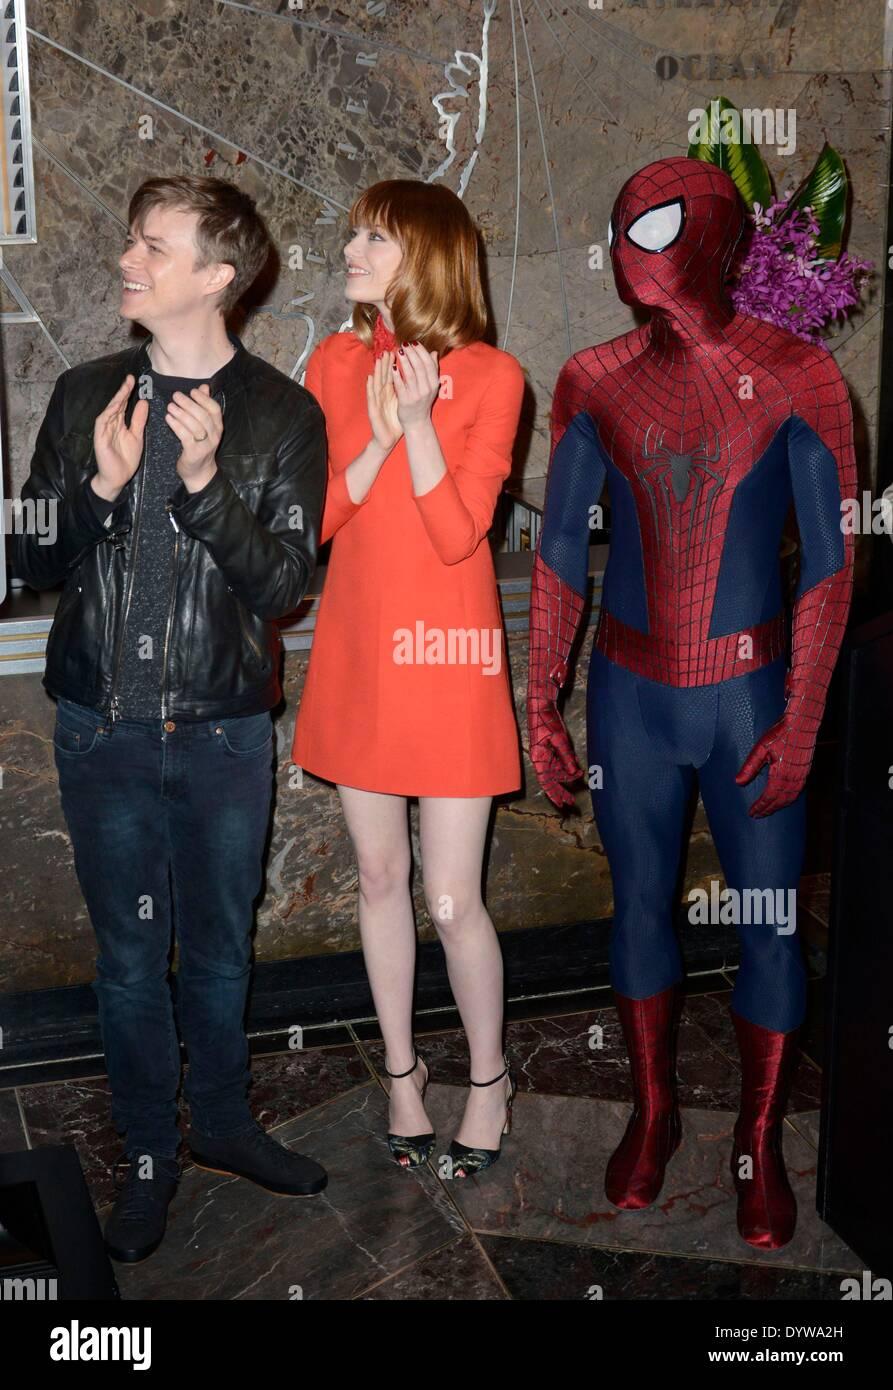 new york, ny, usa. 25. april 2014. dane dehaan, emma stone, spider